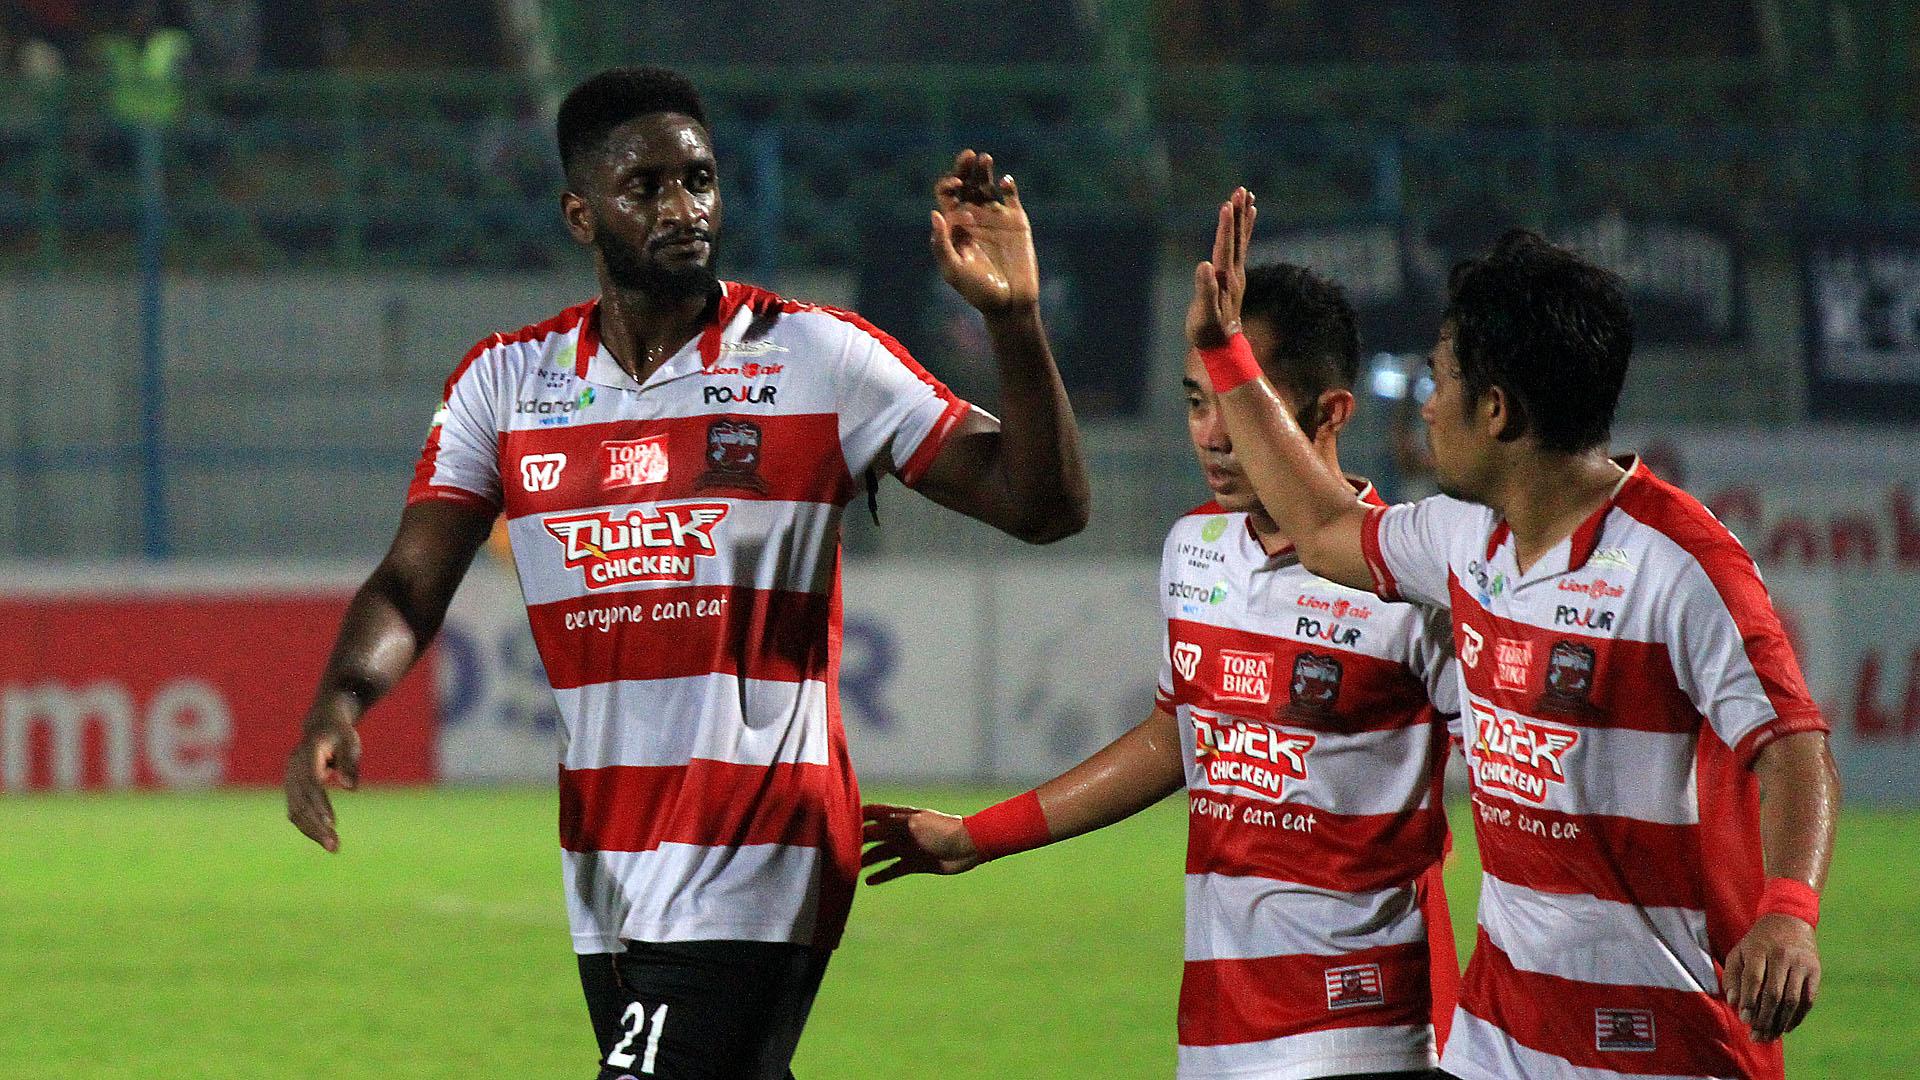 Samassa Mahamadou - Madura United